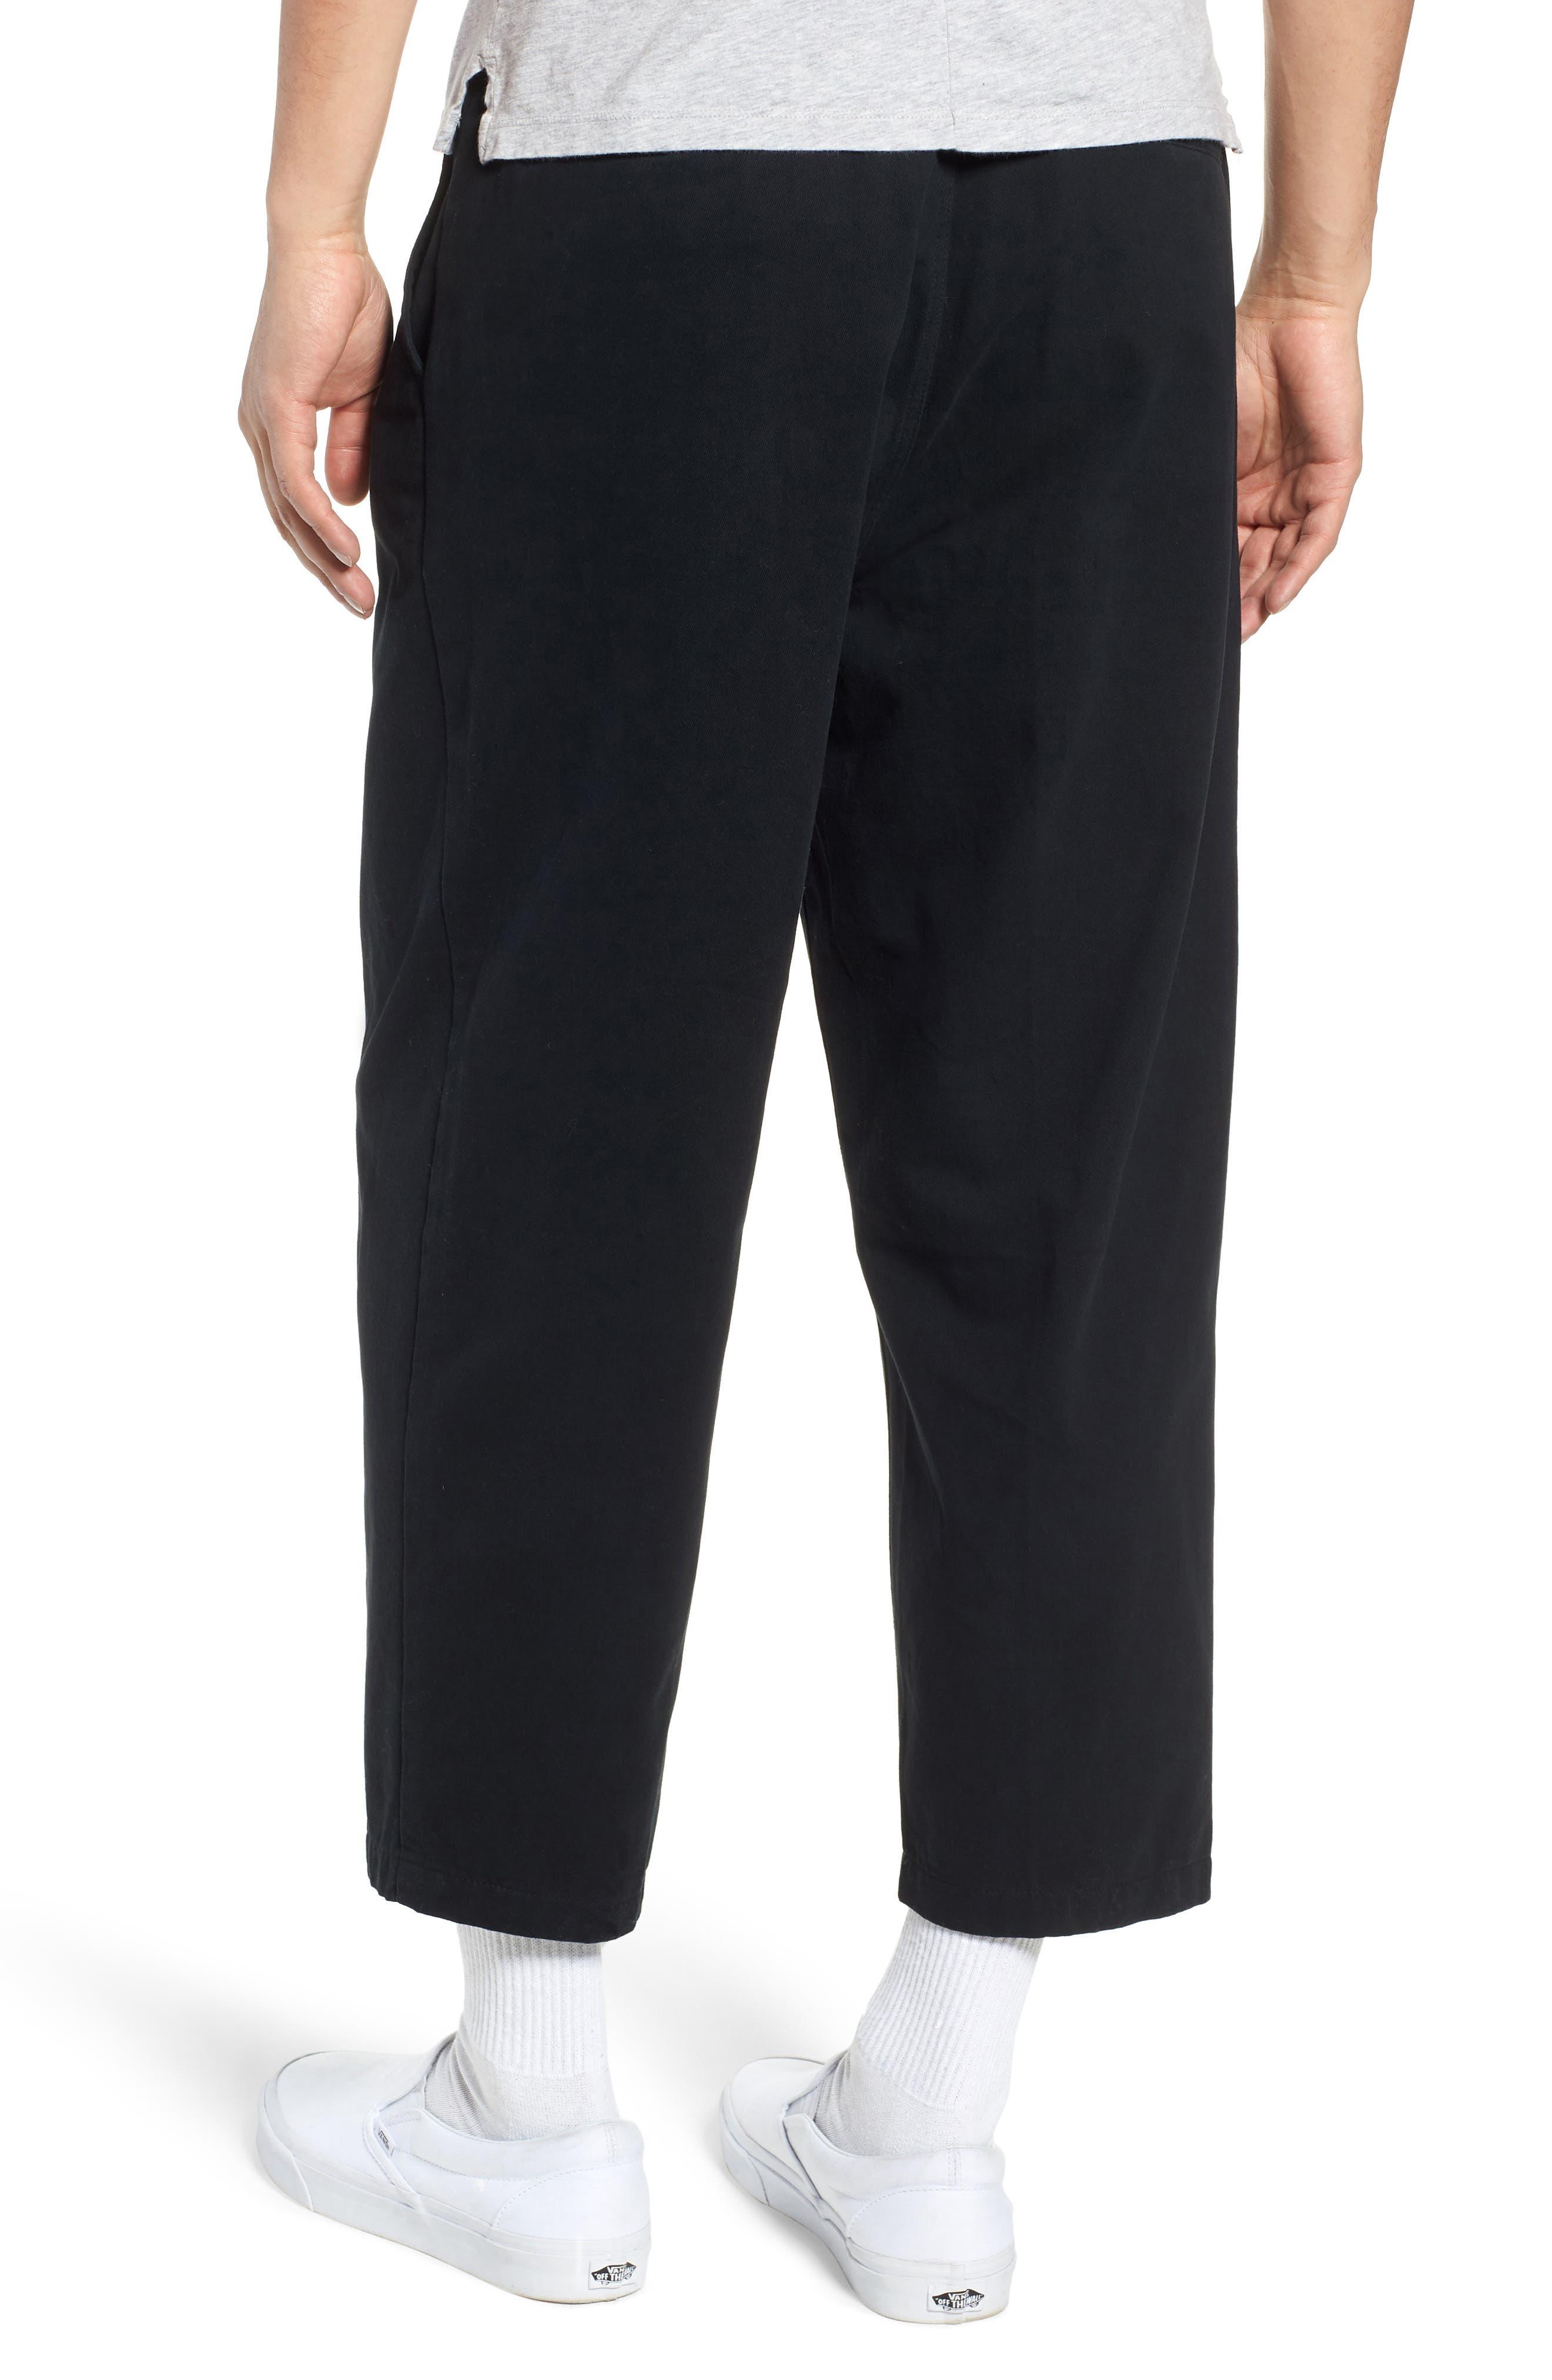 Fubar Pleated Relaxed Fit Pants,                             Alternate thumbnail 2, color,                             BLACK